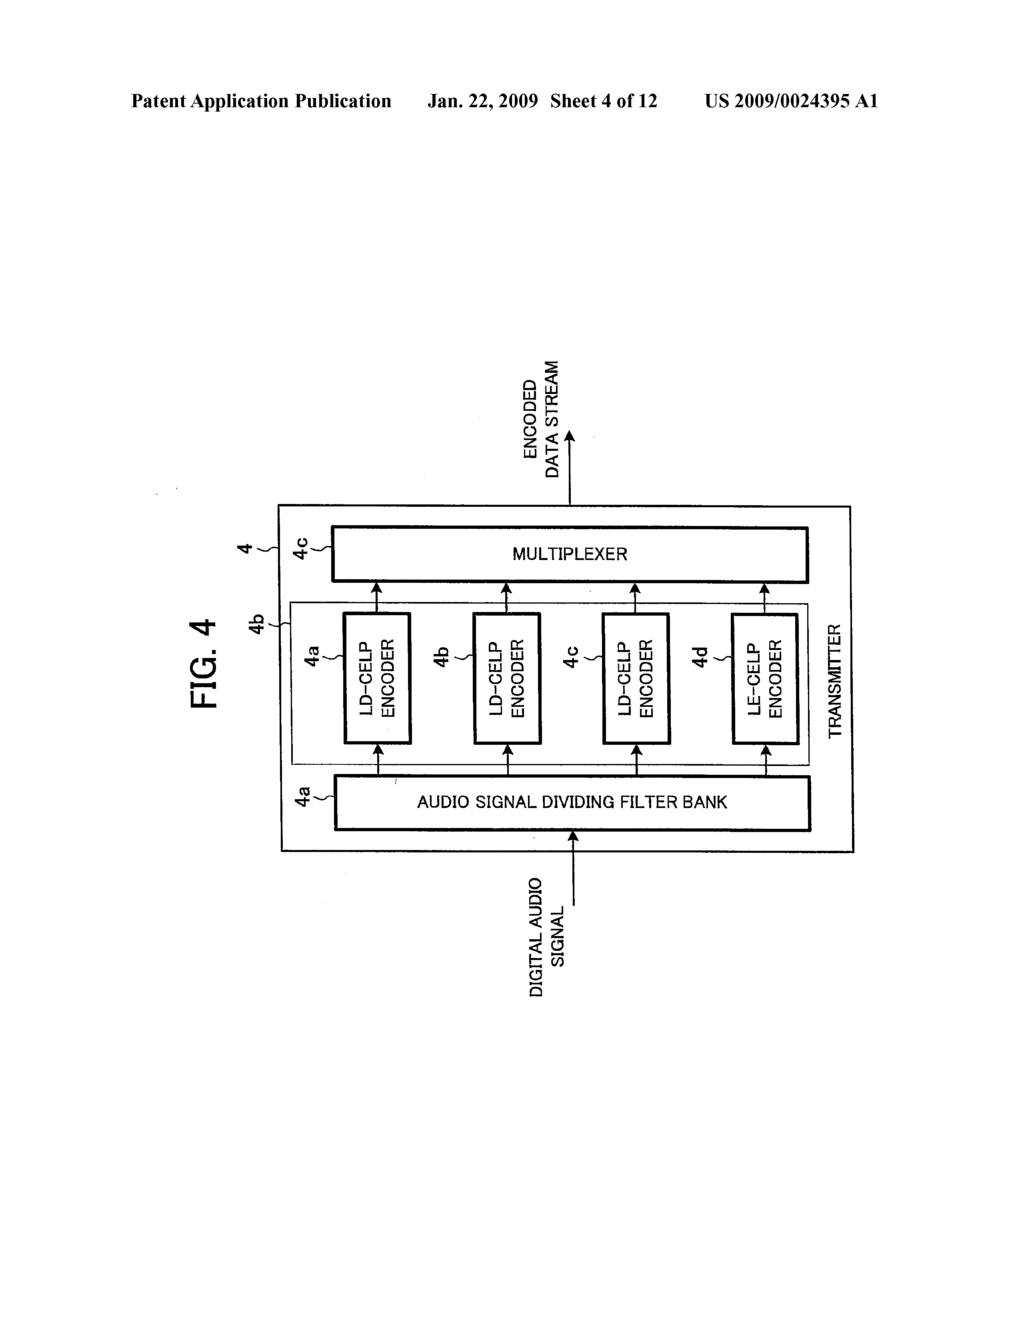 Microphone System Diagram Diy Enthusiasts Wiring Diagrams Xlr Audio Signal Encoding Method Decoding Rh Patentsencyclopedia Com 4 Pair Parts